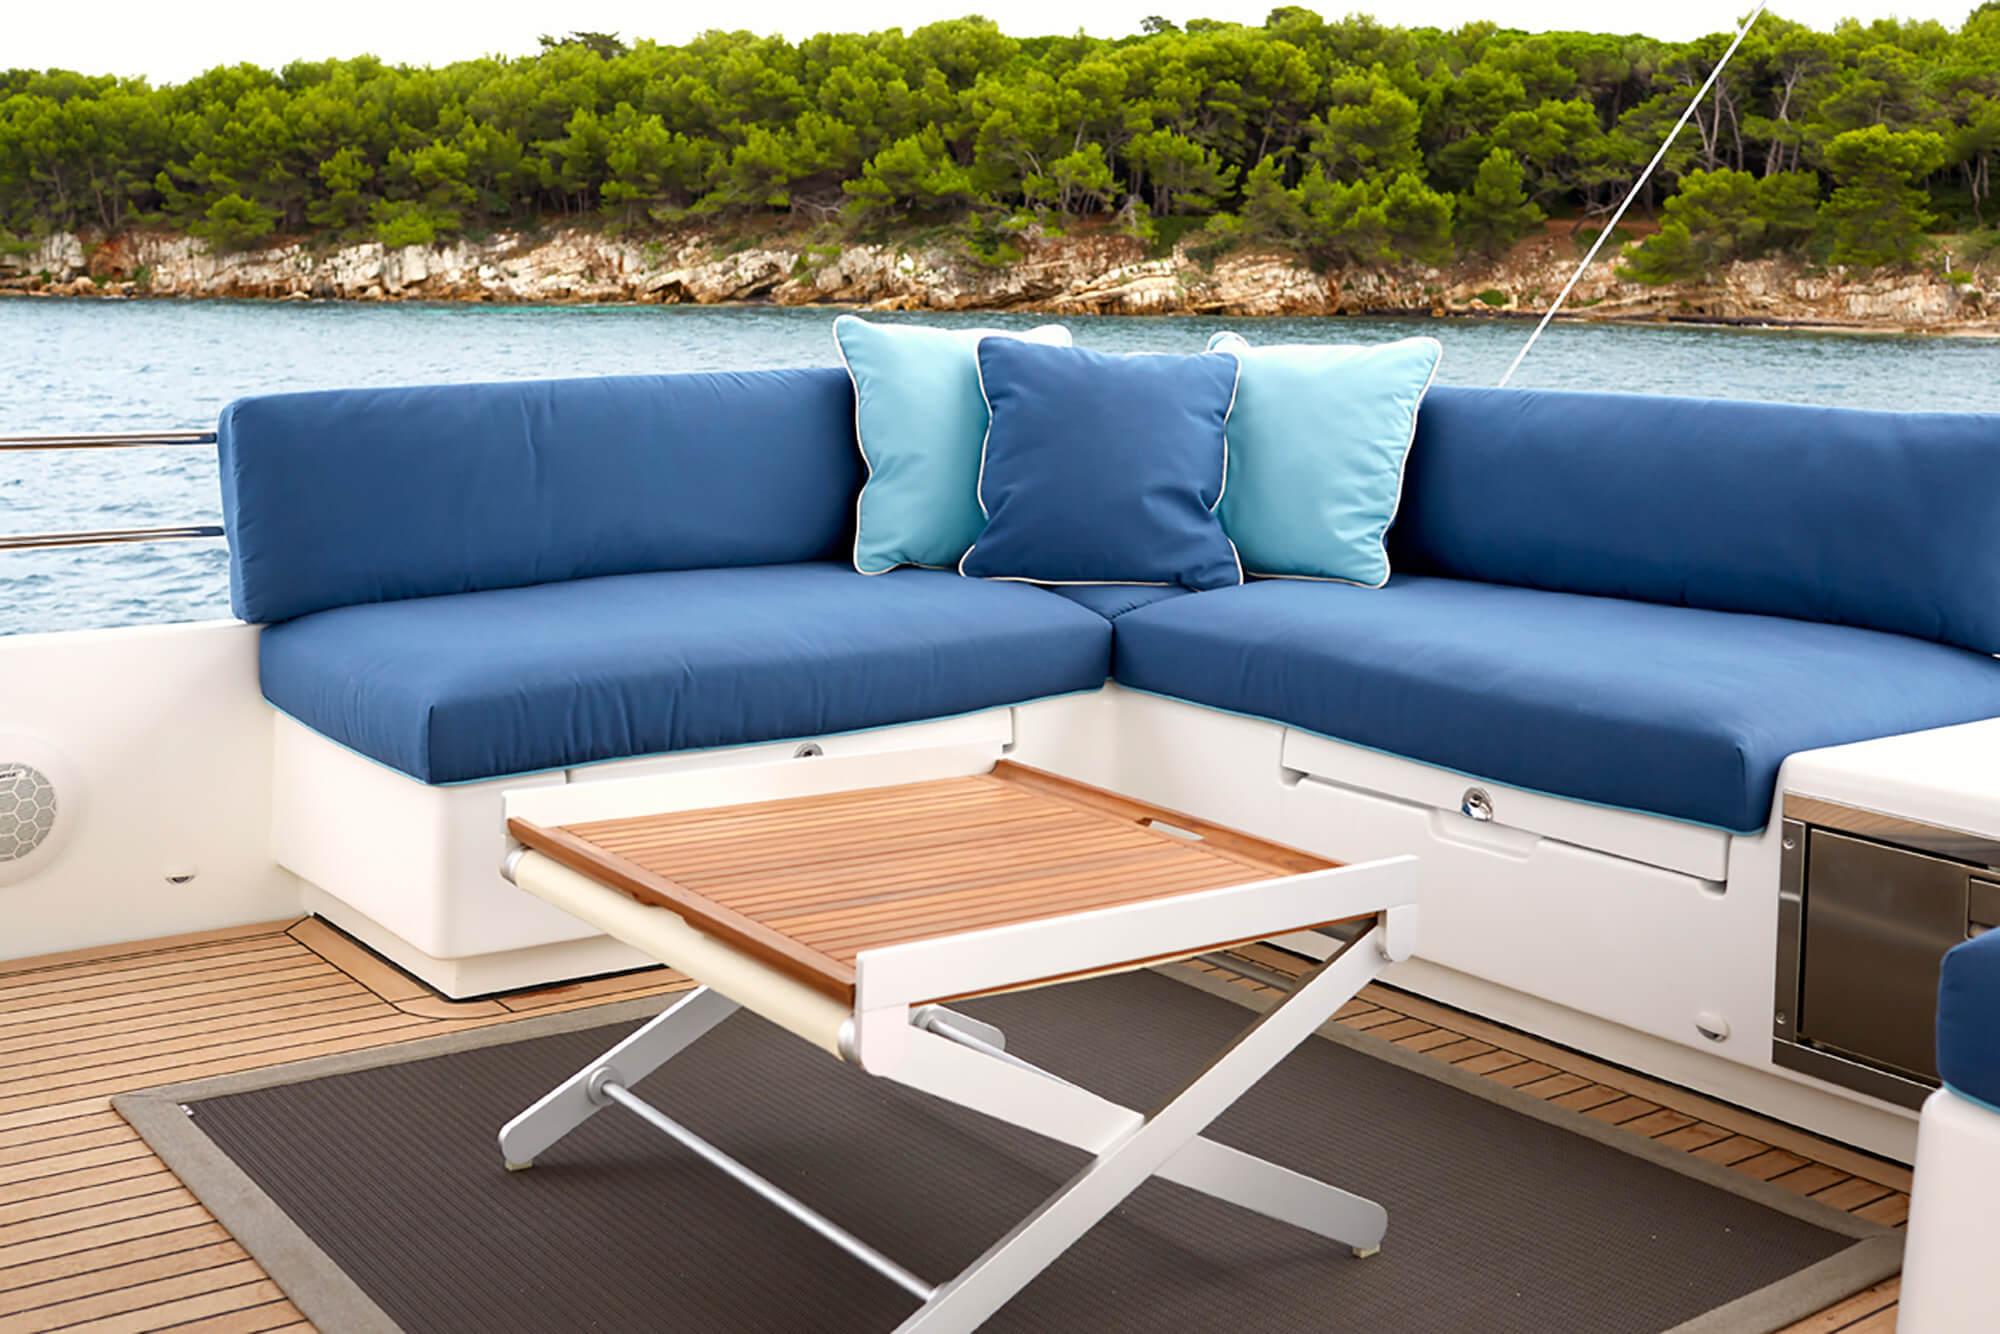 marine deck chairs desk chair no casters upholstery fabrics sunbrella